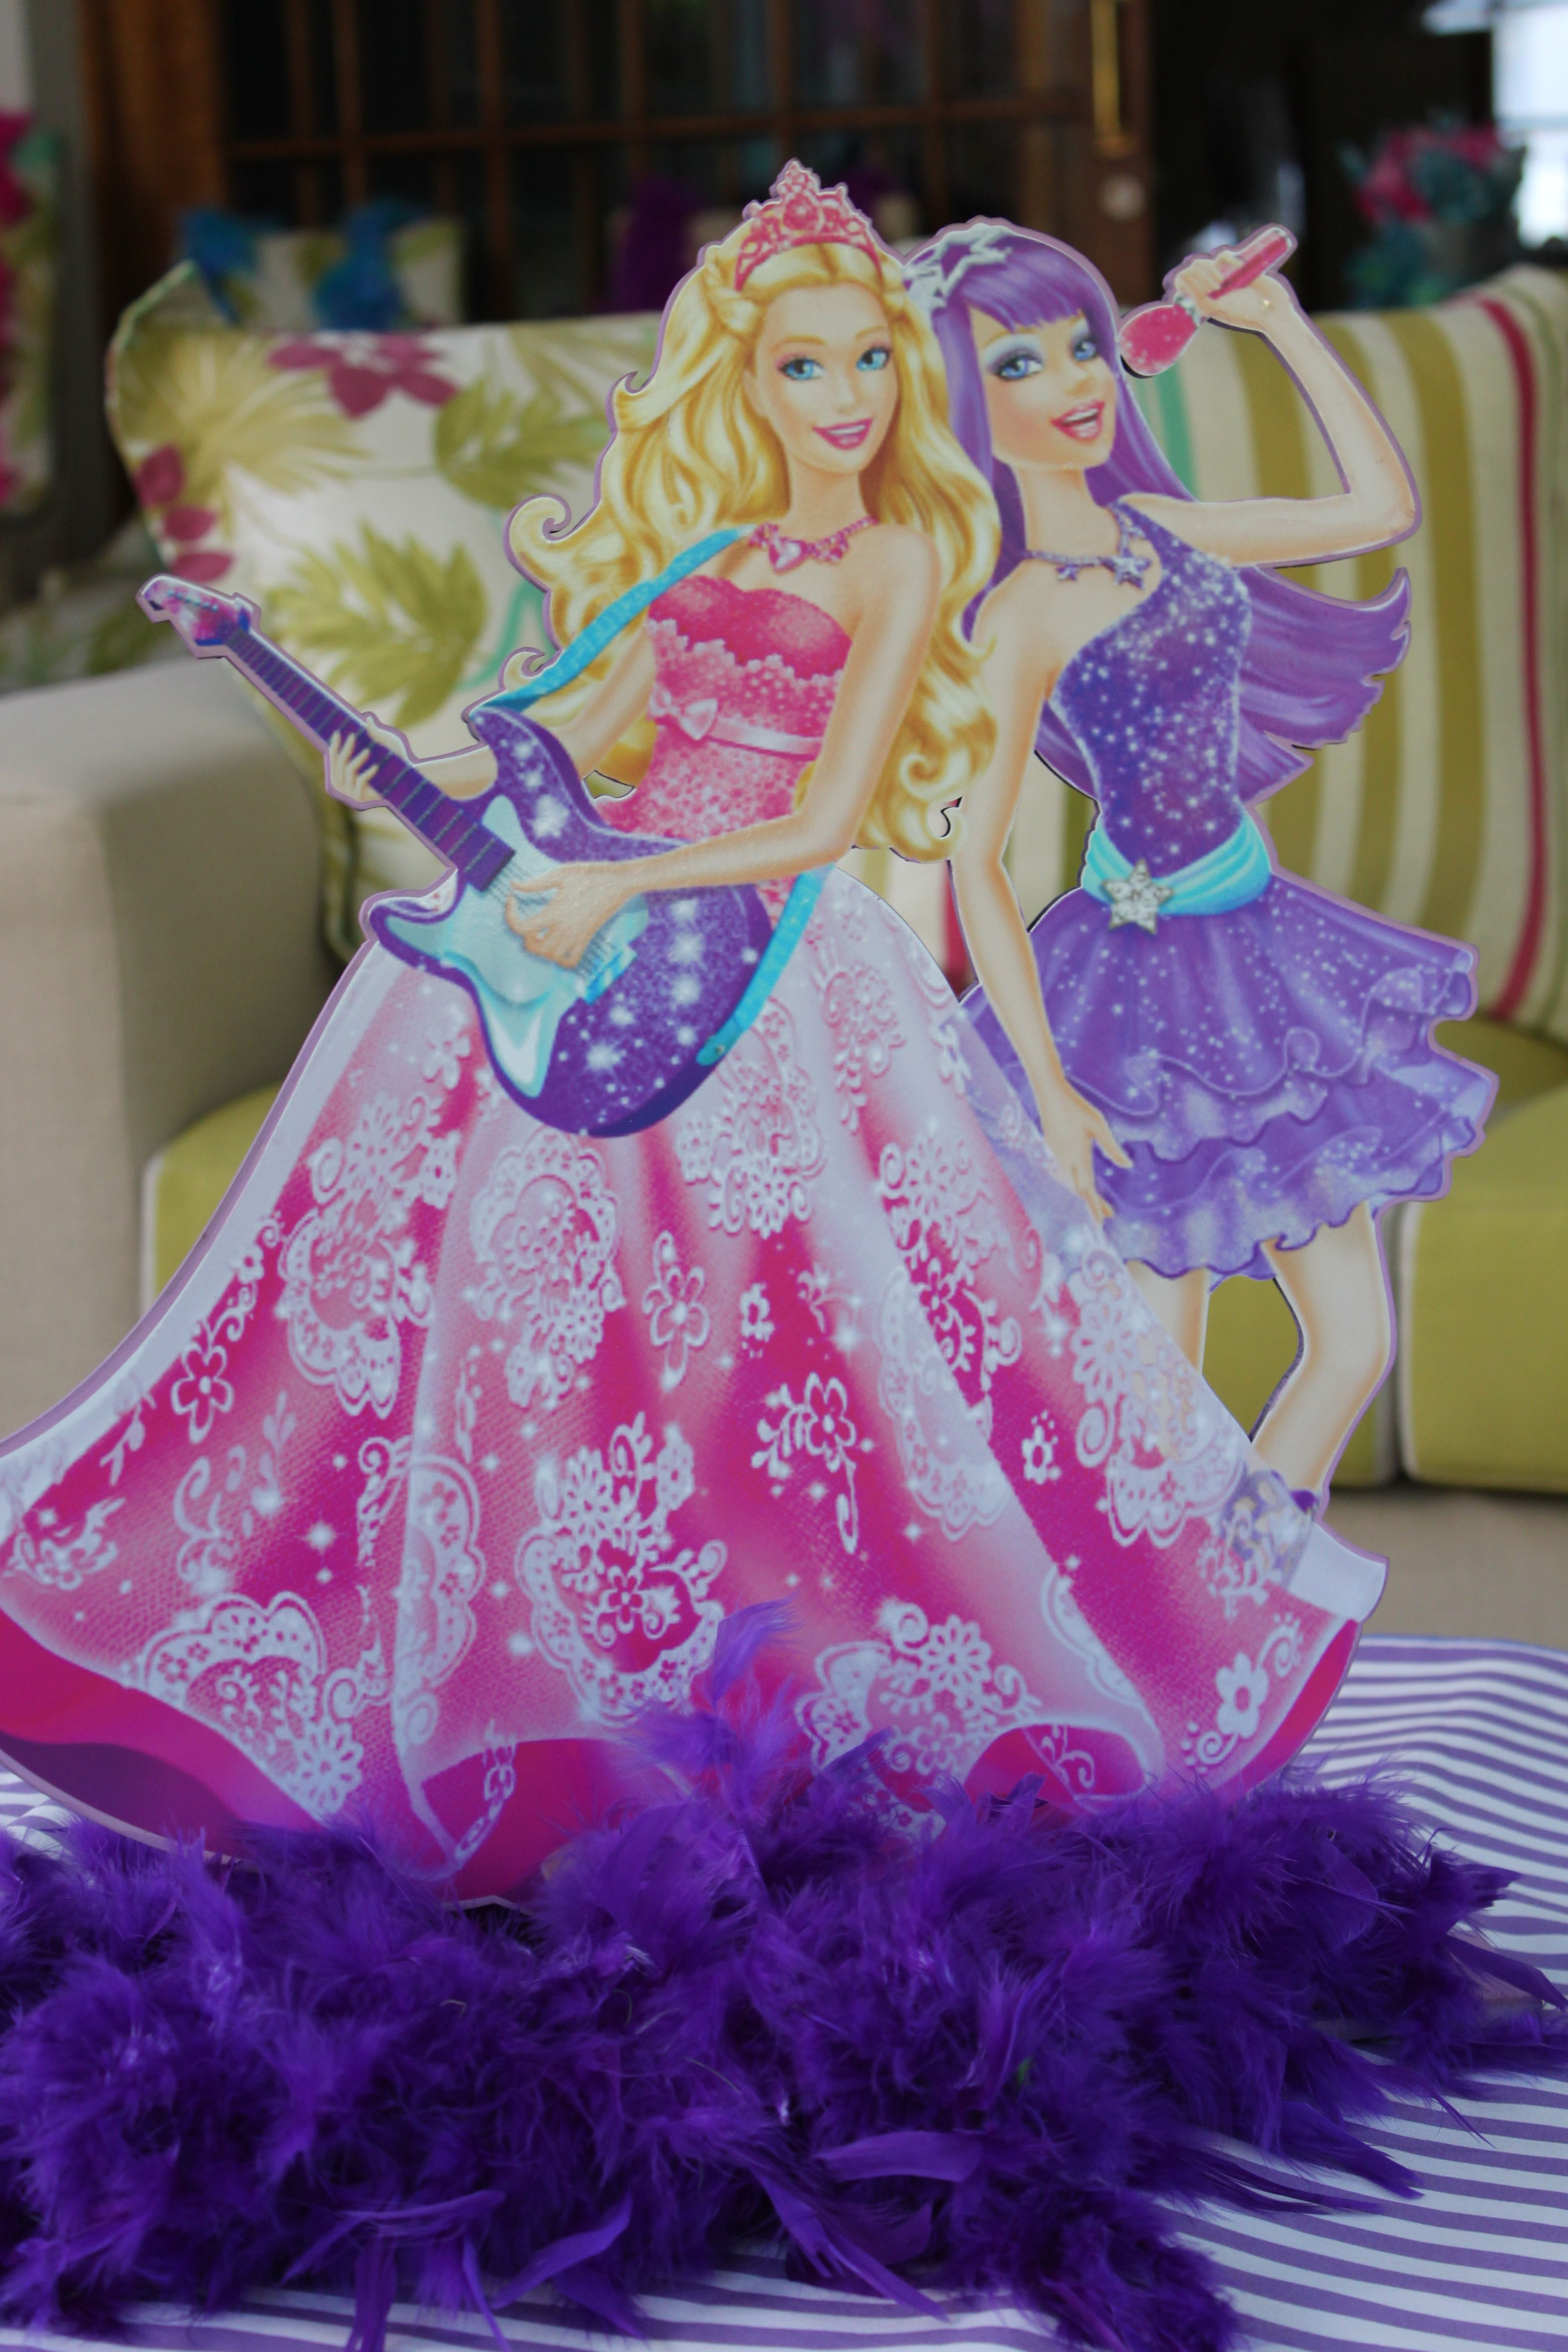 Barbie And The Pop Star Barbie And The Pop Star